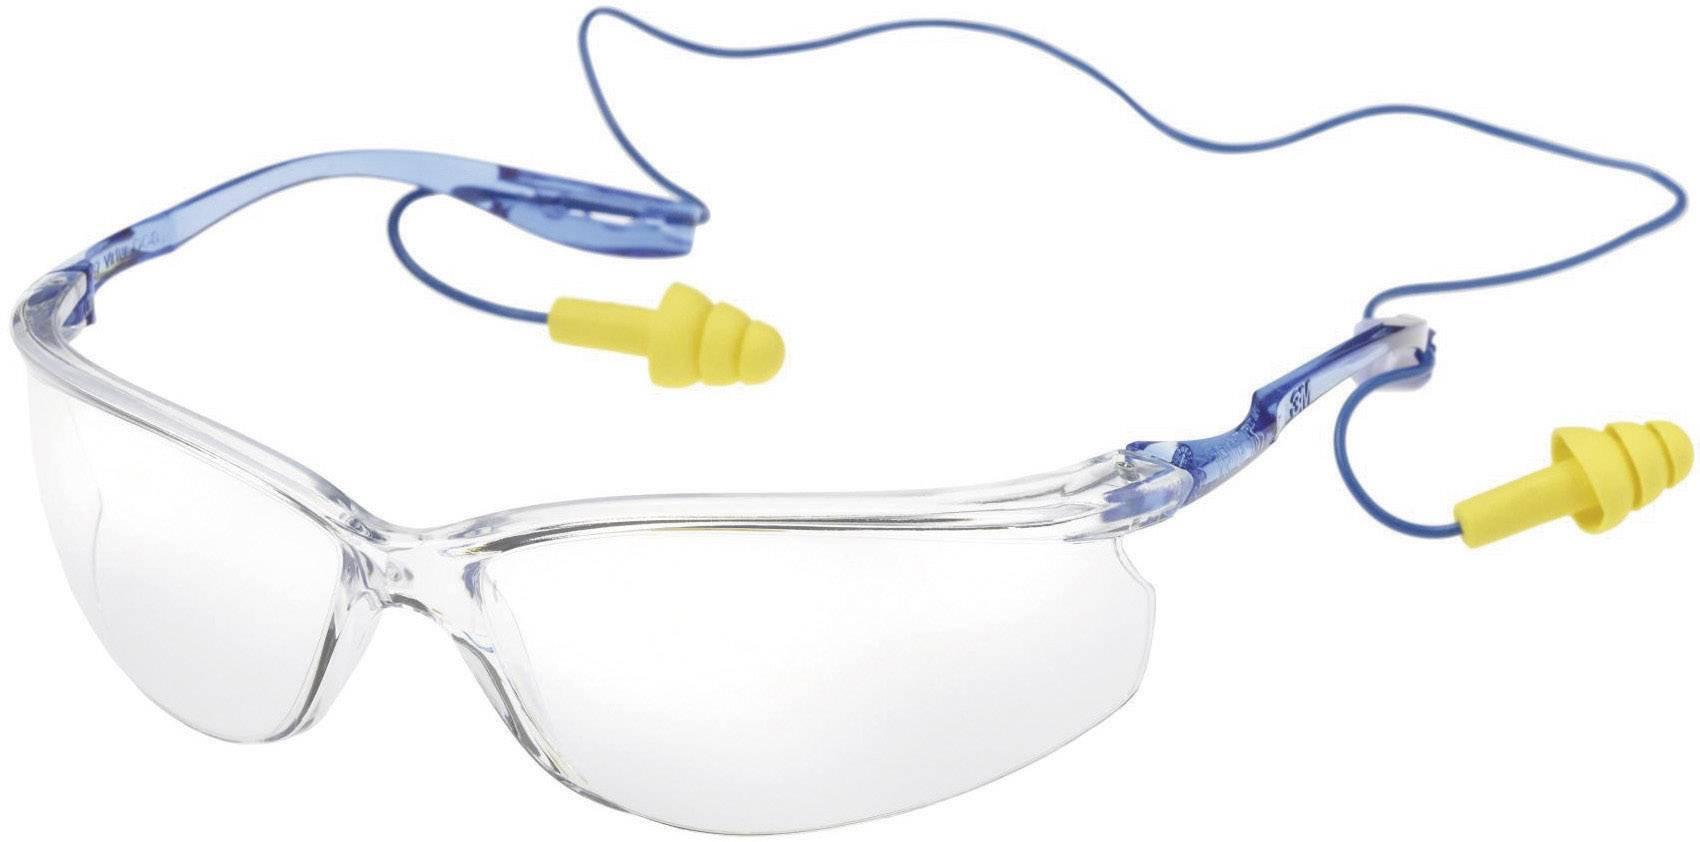 Ochranné okuliare 3M Tora CCS